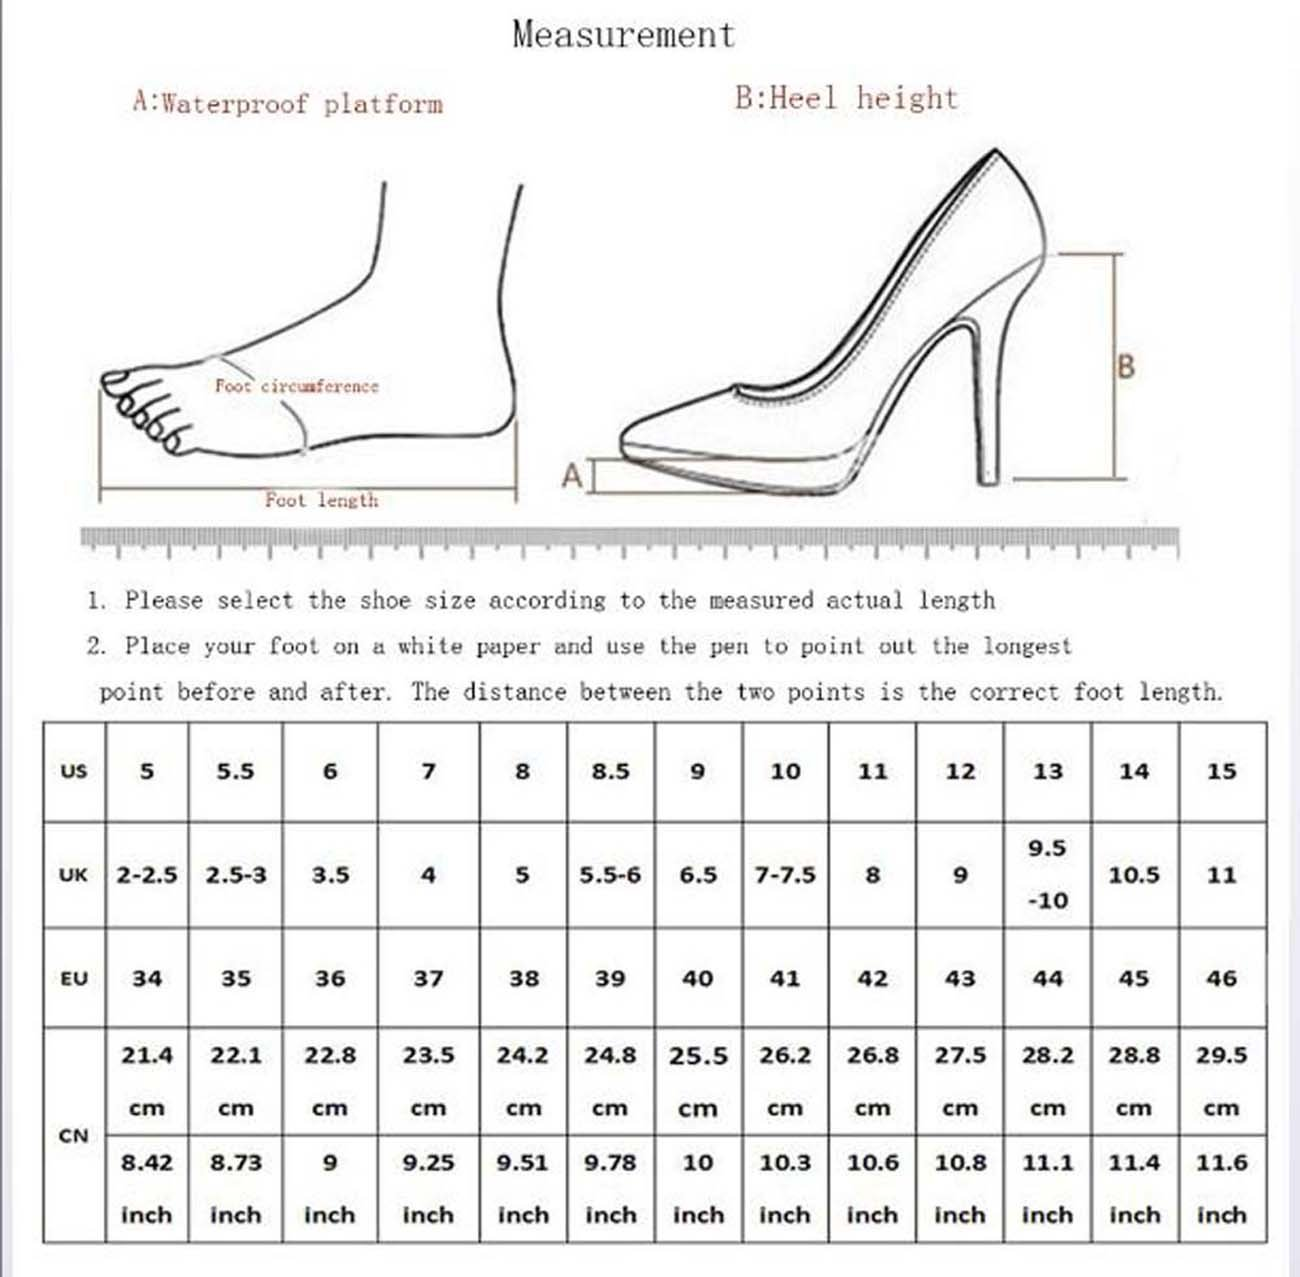 GONGFF Strass Reißverschluss Verziert Verziert Verziert mit Hohen Absätzen Sandalen Süße Mode mit Einem Einzigen Schuh Hochzeit Schuhe B07F5M8V6X Tanzschuhe Spezielle Funktion 6404c8